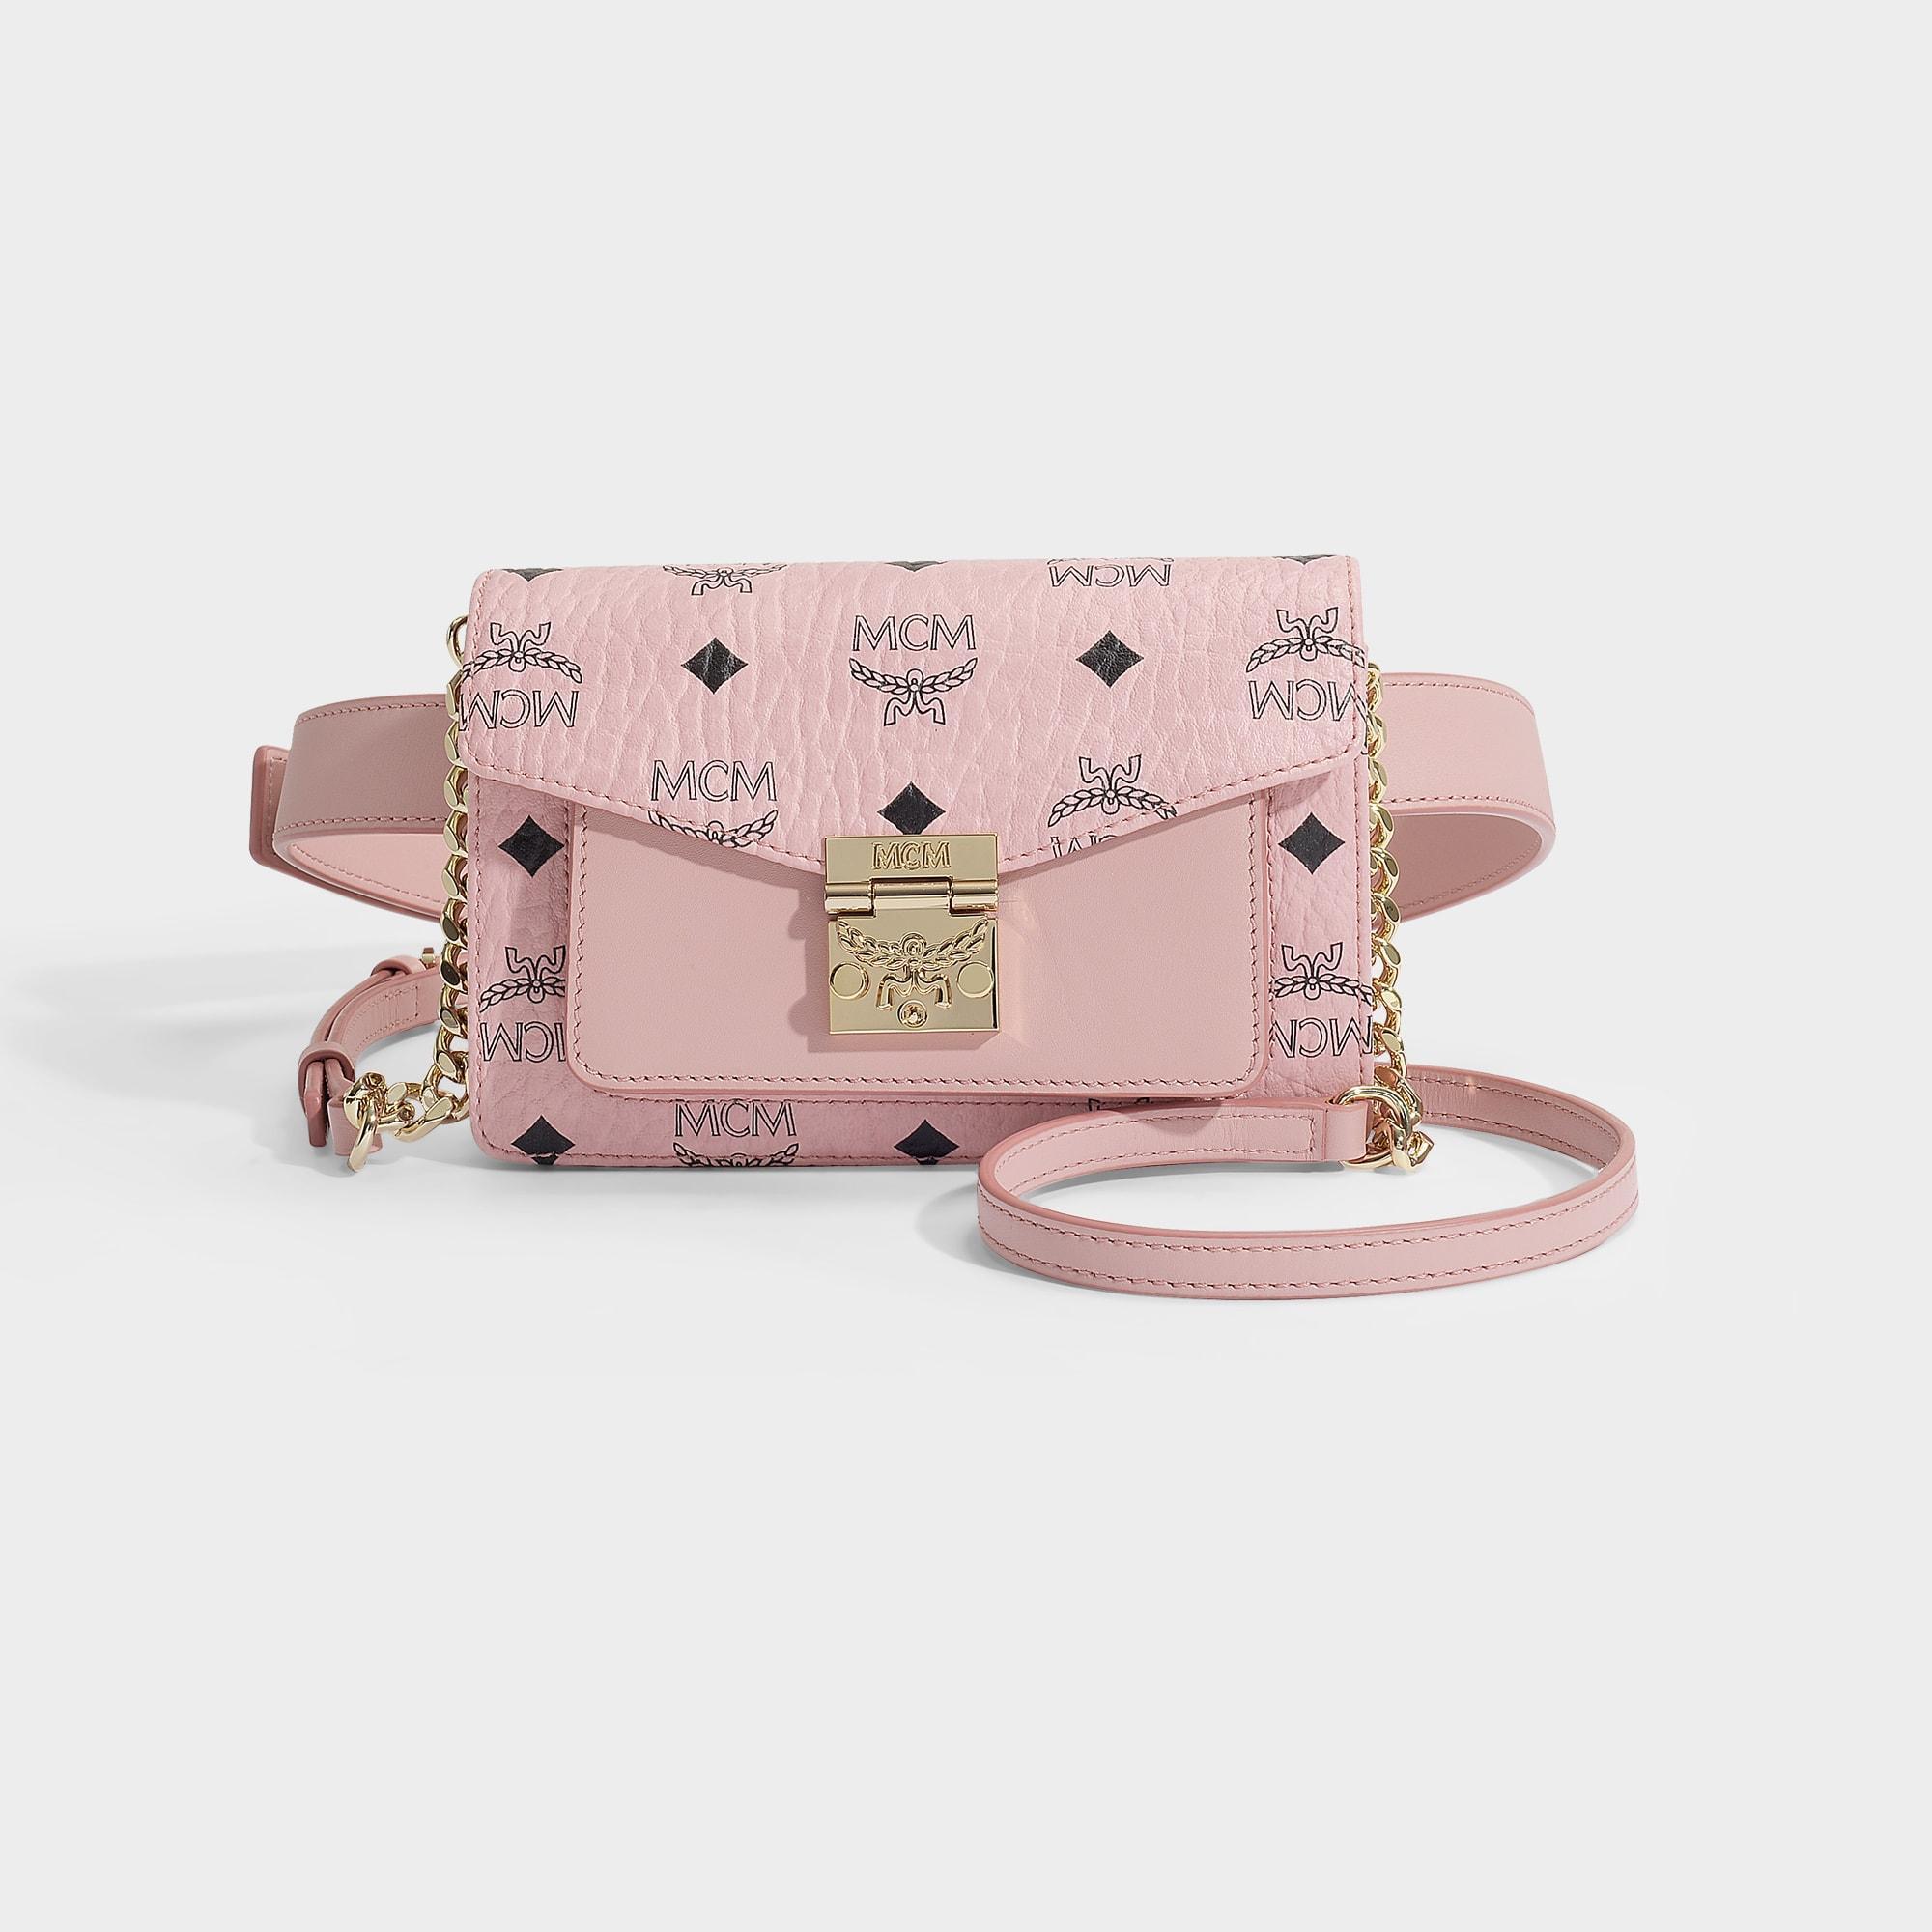 78f8eb61ca8 MCM Patricia Visetos Xmini Belt Bag In Pale Pink Coated Canvas